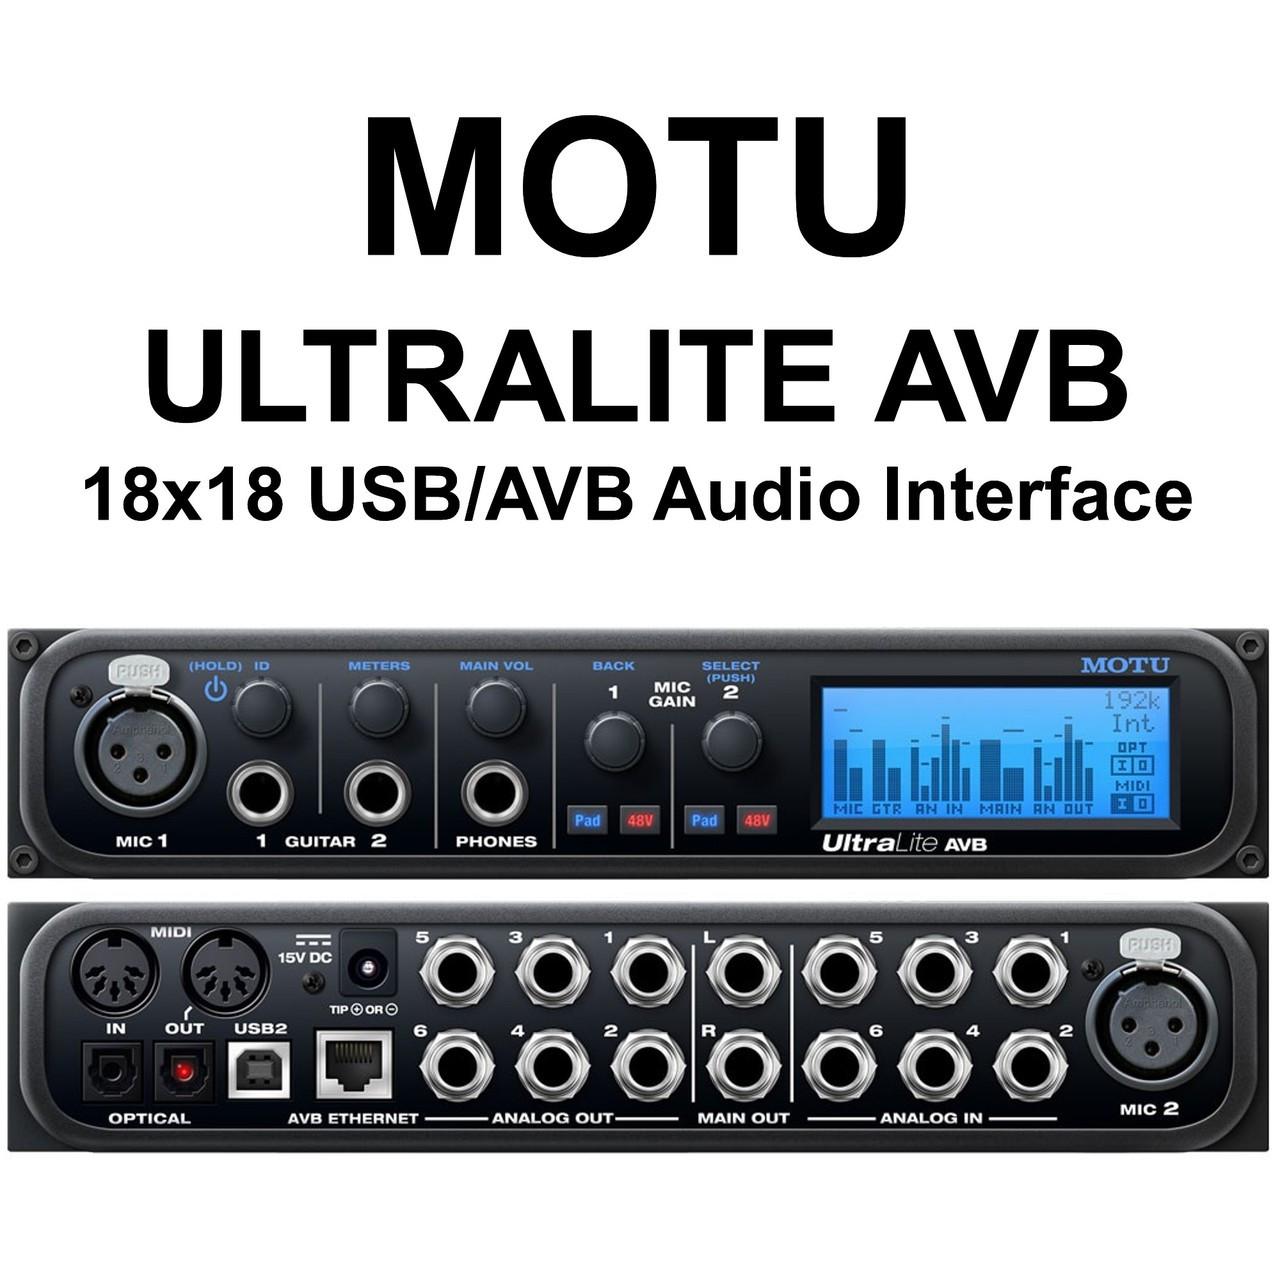 MOTU ULTRALITE AVB 18x18 Compact Ethernet USB Audio Interface $25 Instant  Coupon use Promo Code: $25-OFF